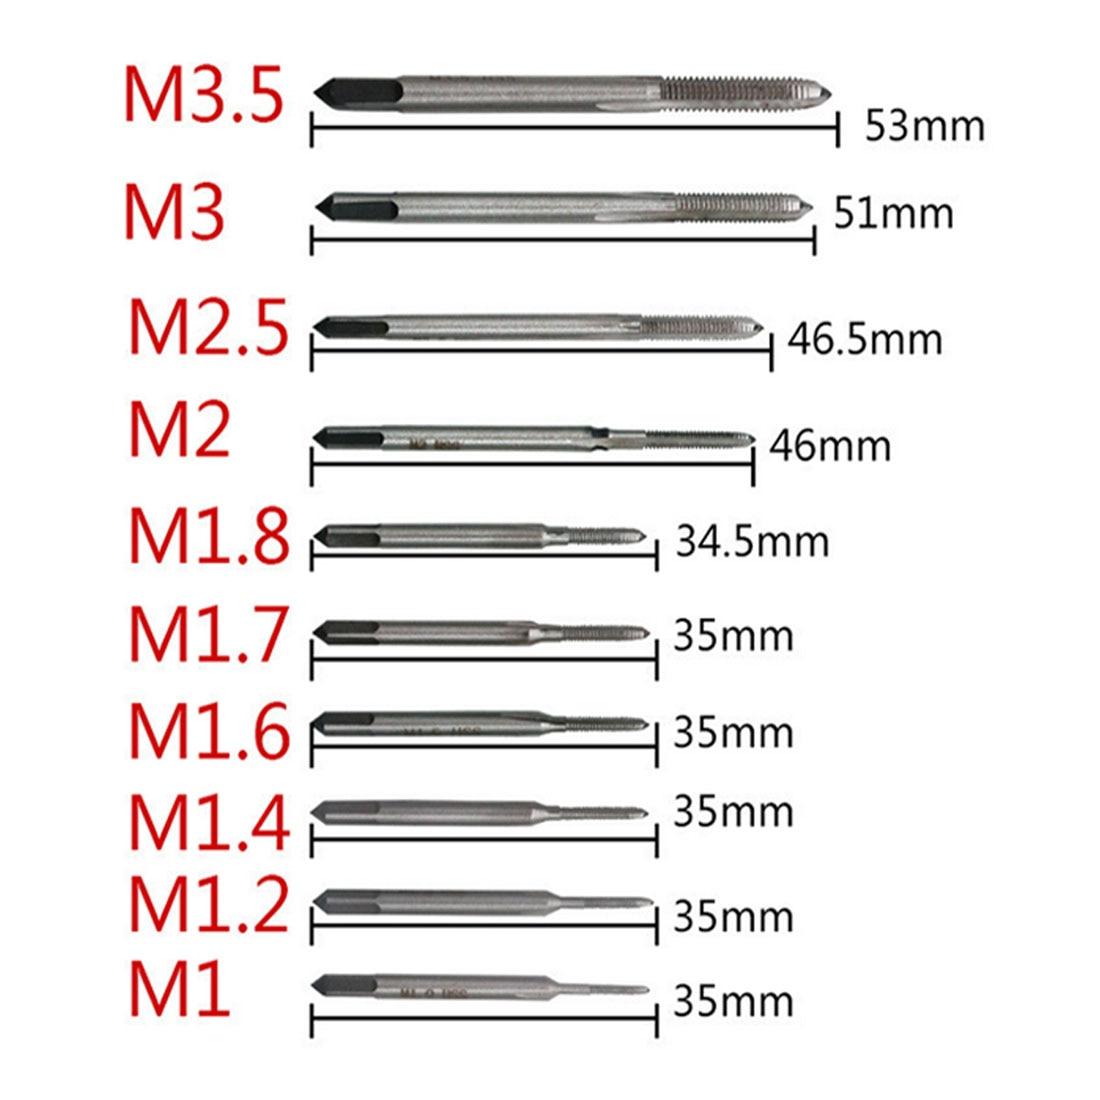 Free shipping 10pcs/set Hand Tools Tap Thread Wire Tapping/Threading/Taps/Attack M1 M1.2 M1.4 M1.6 M1.7 M1.8 M2 M 2.5 M 3 M3.5 велосипед challenger agent lux 26 черно серый 18